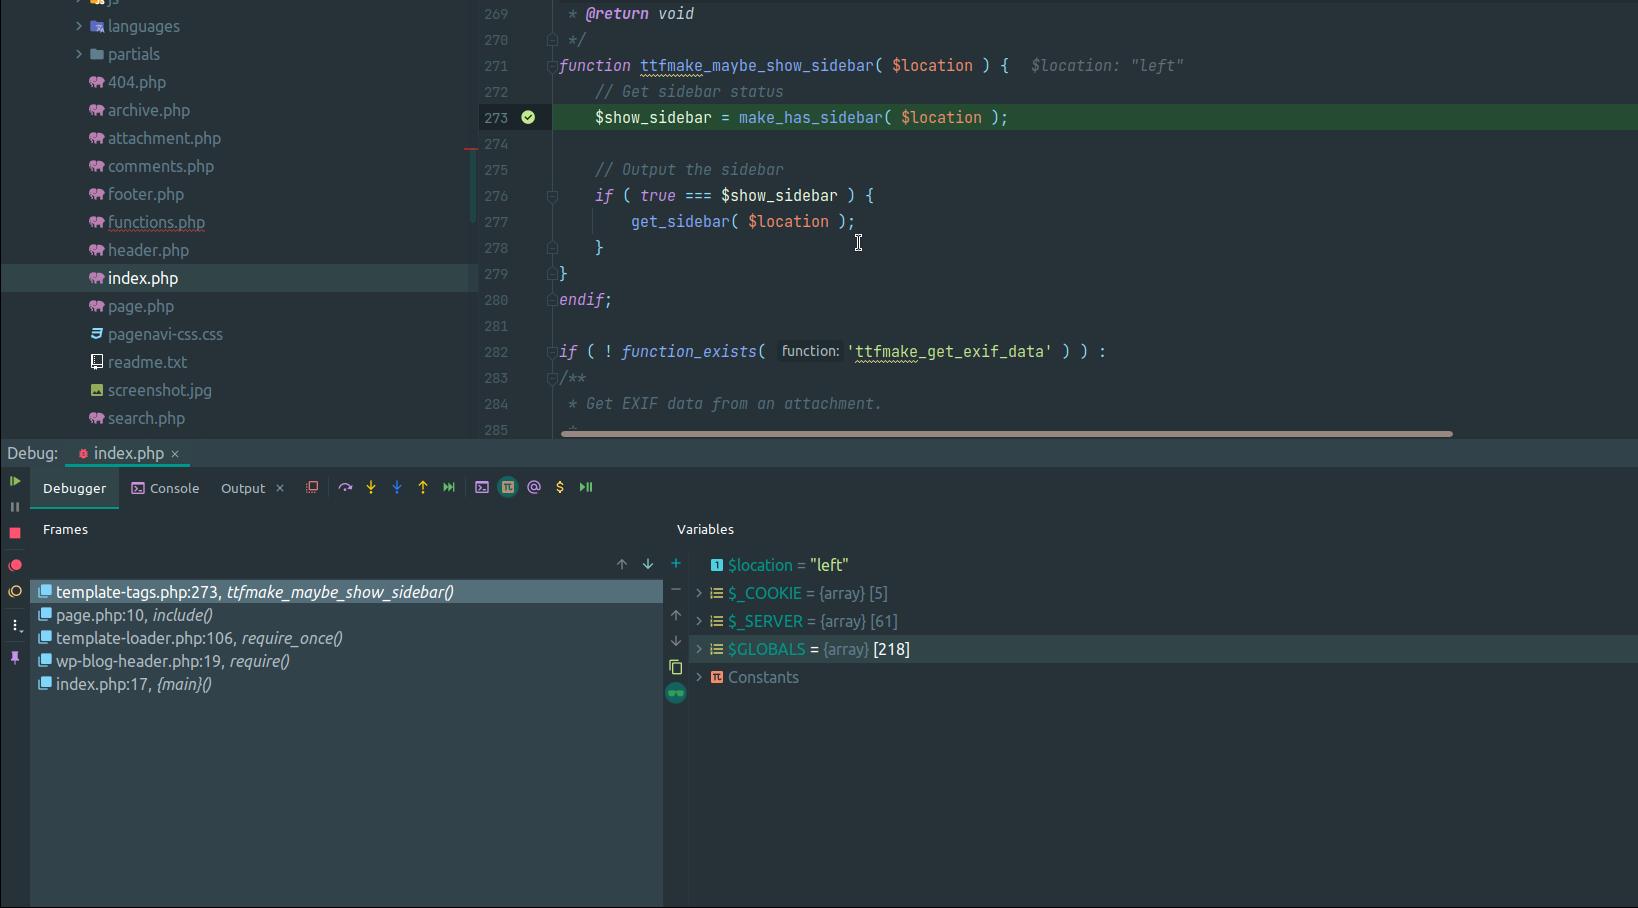 PhpStorm Xdebug debugging panel